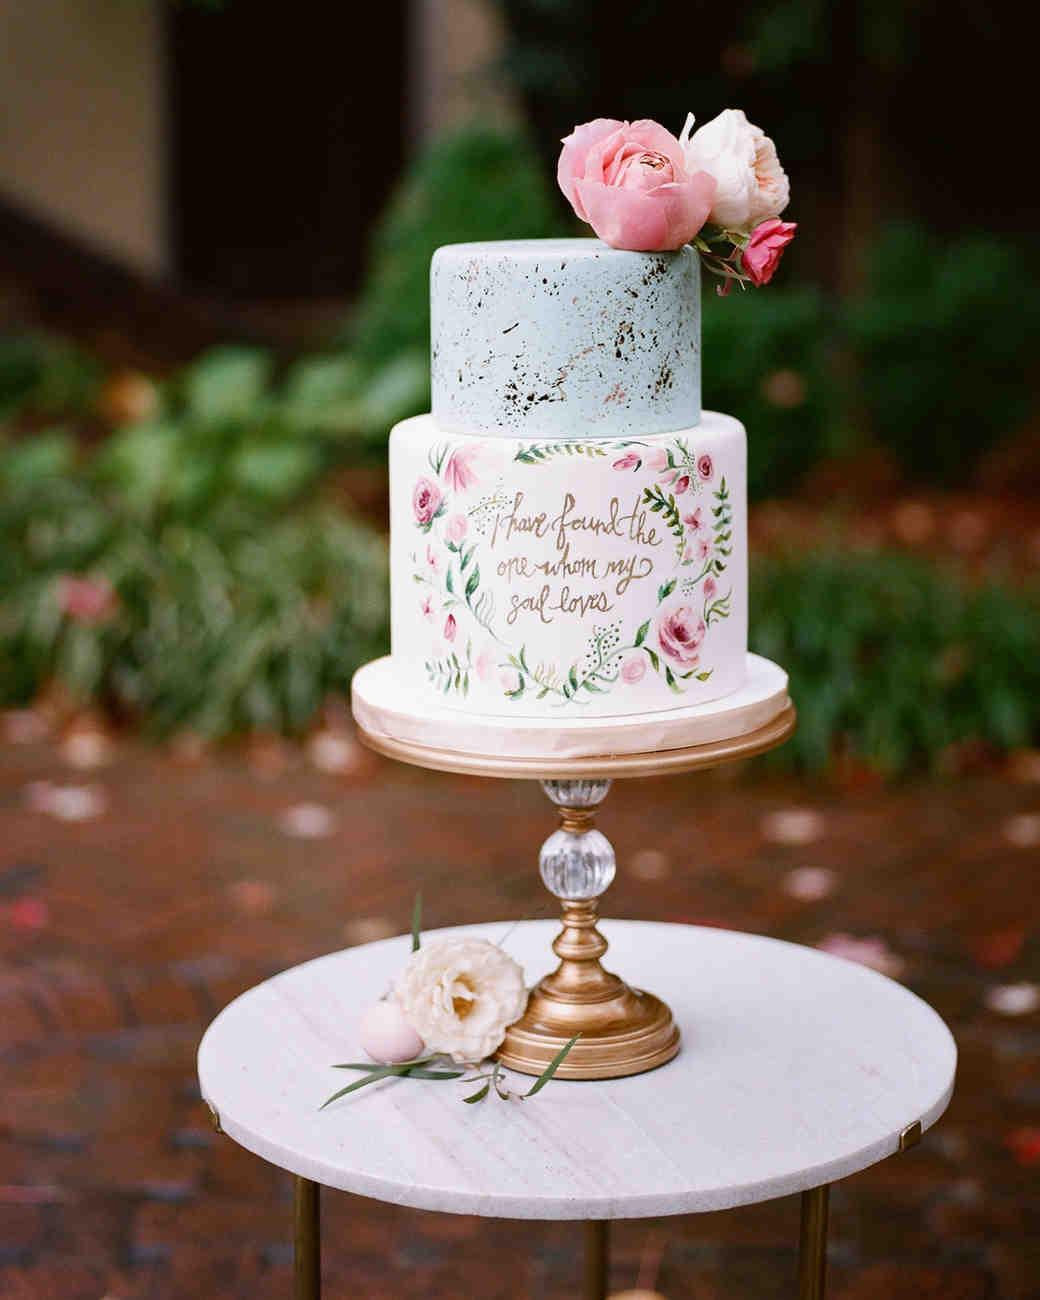 Sarasota Beach Weddings - Sarasota Glam Events -small-wedding-cake (1).jpg